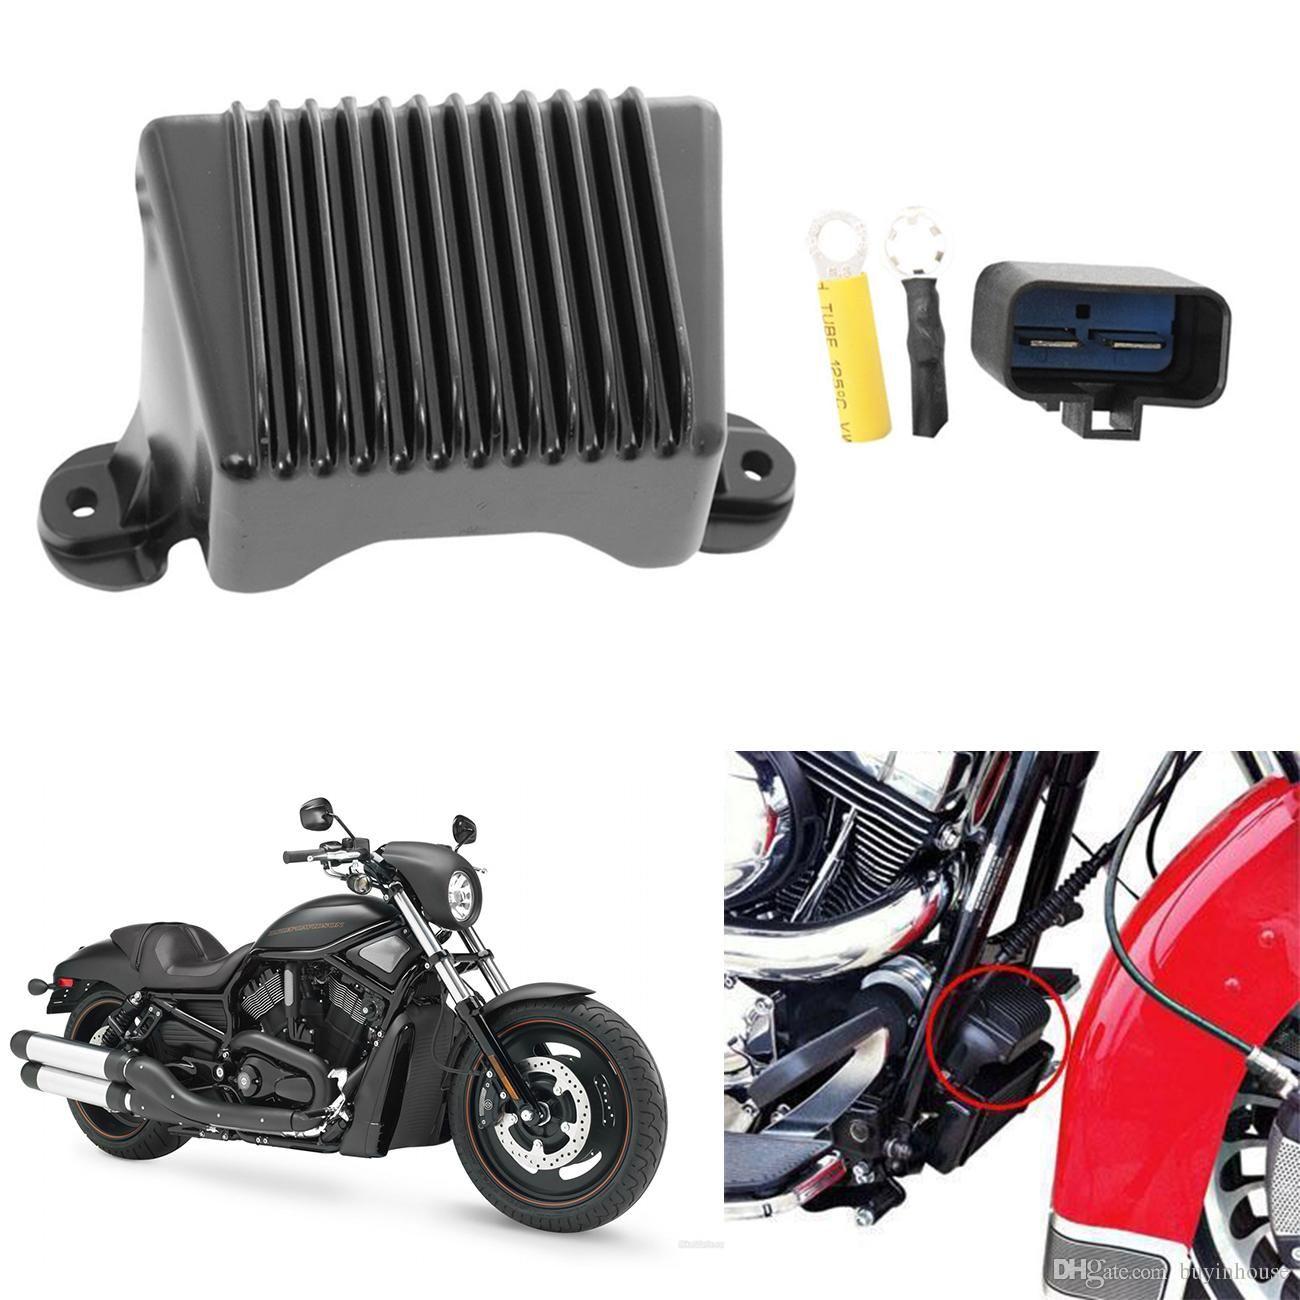 Motorbike Ingition Automobiles & Motorcycles Motorcycle Voltage Regulator Rectifier For All Harley Davidson Touring Models 1997~2001